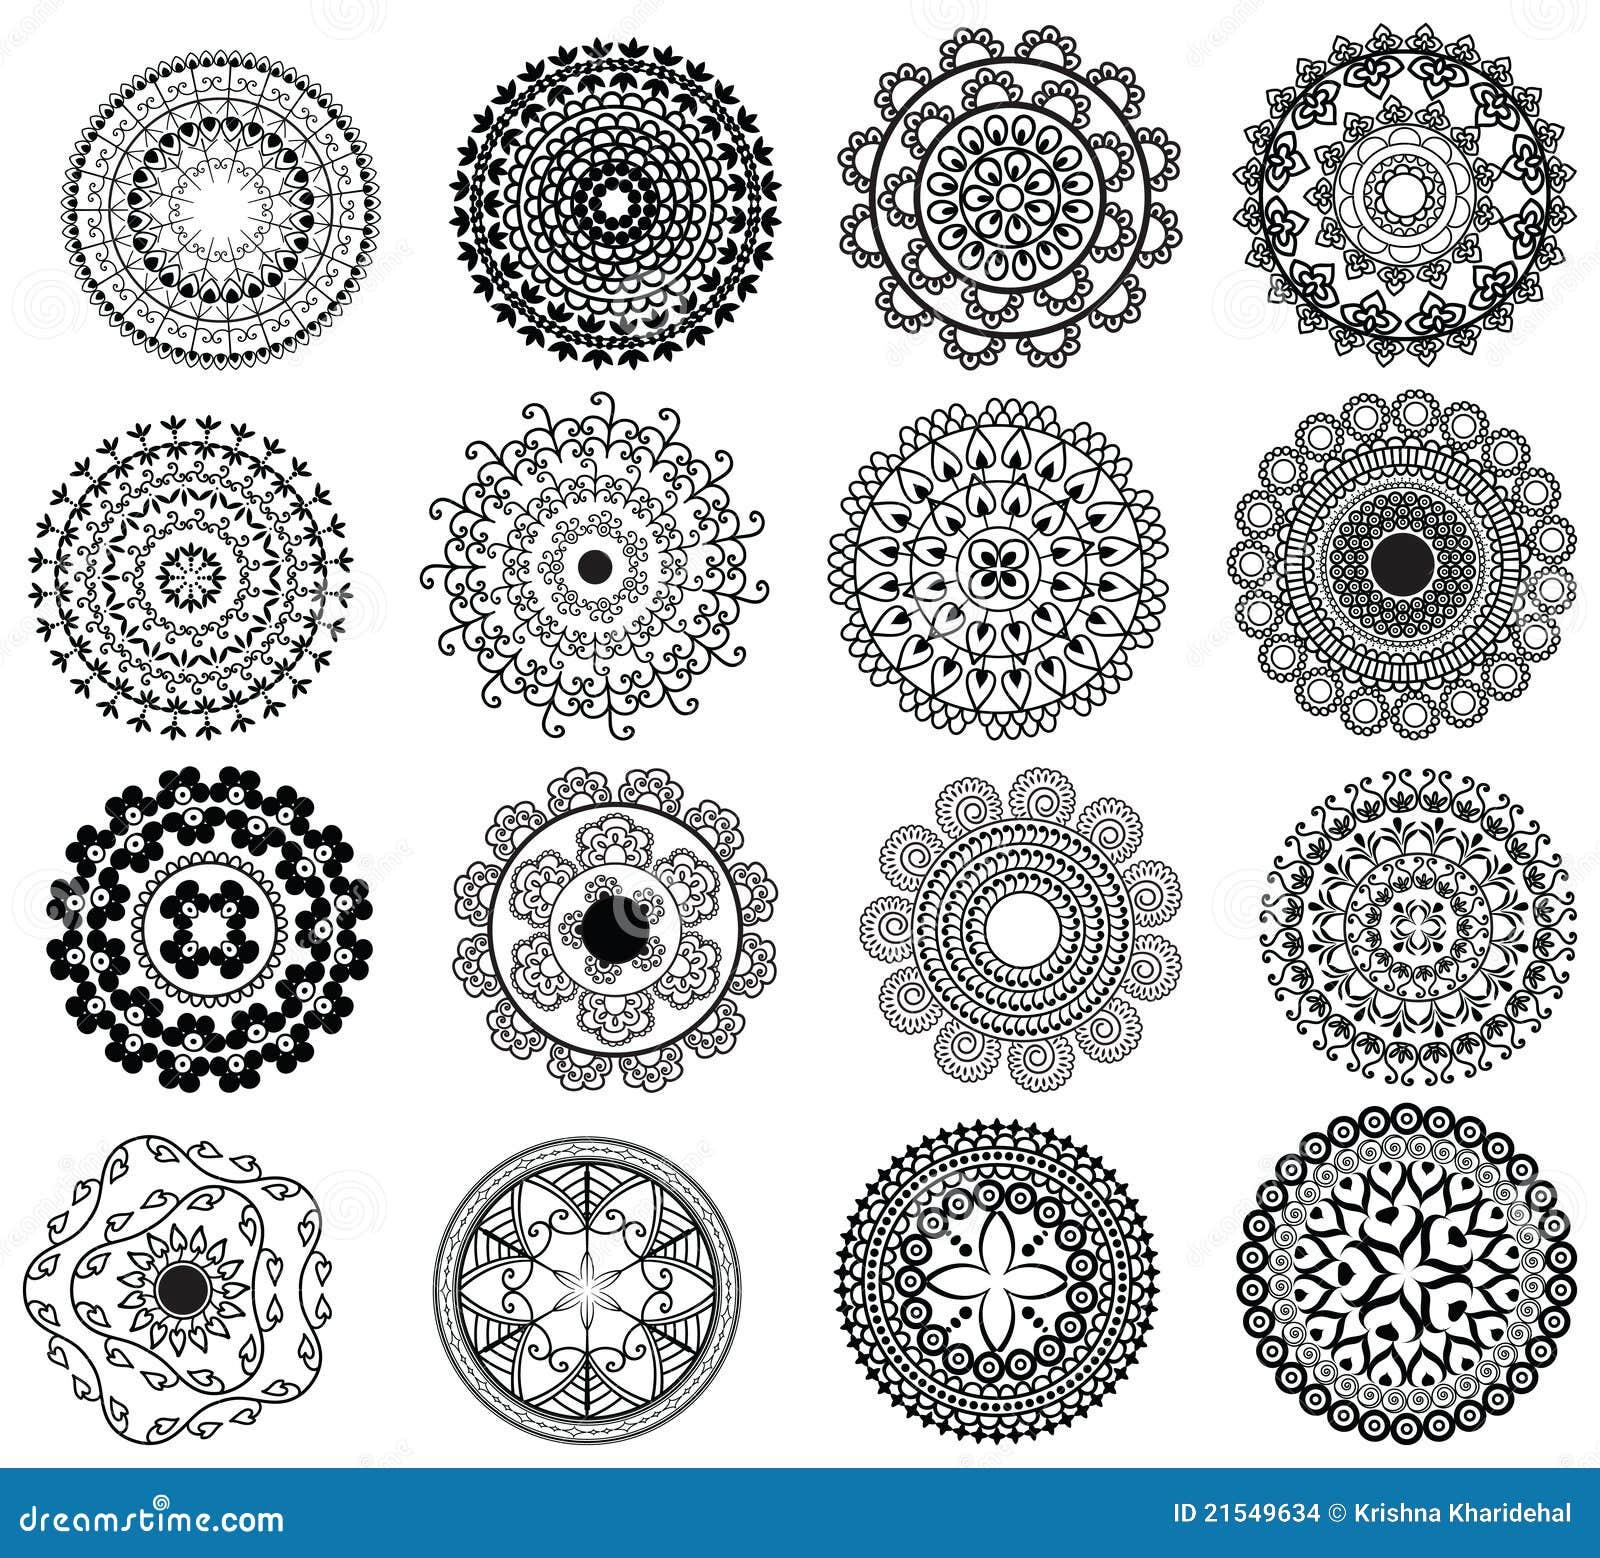 Dise o detallado de la mandala imagenes de archivo for Disenos de mandalas